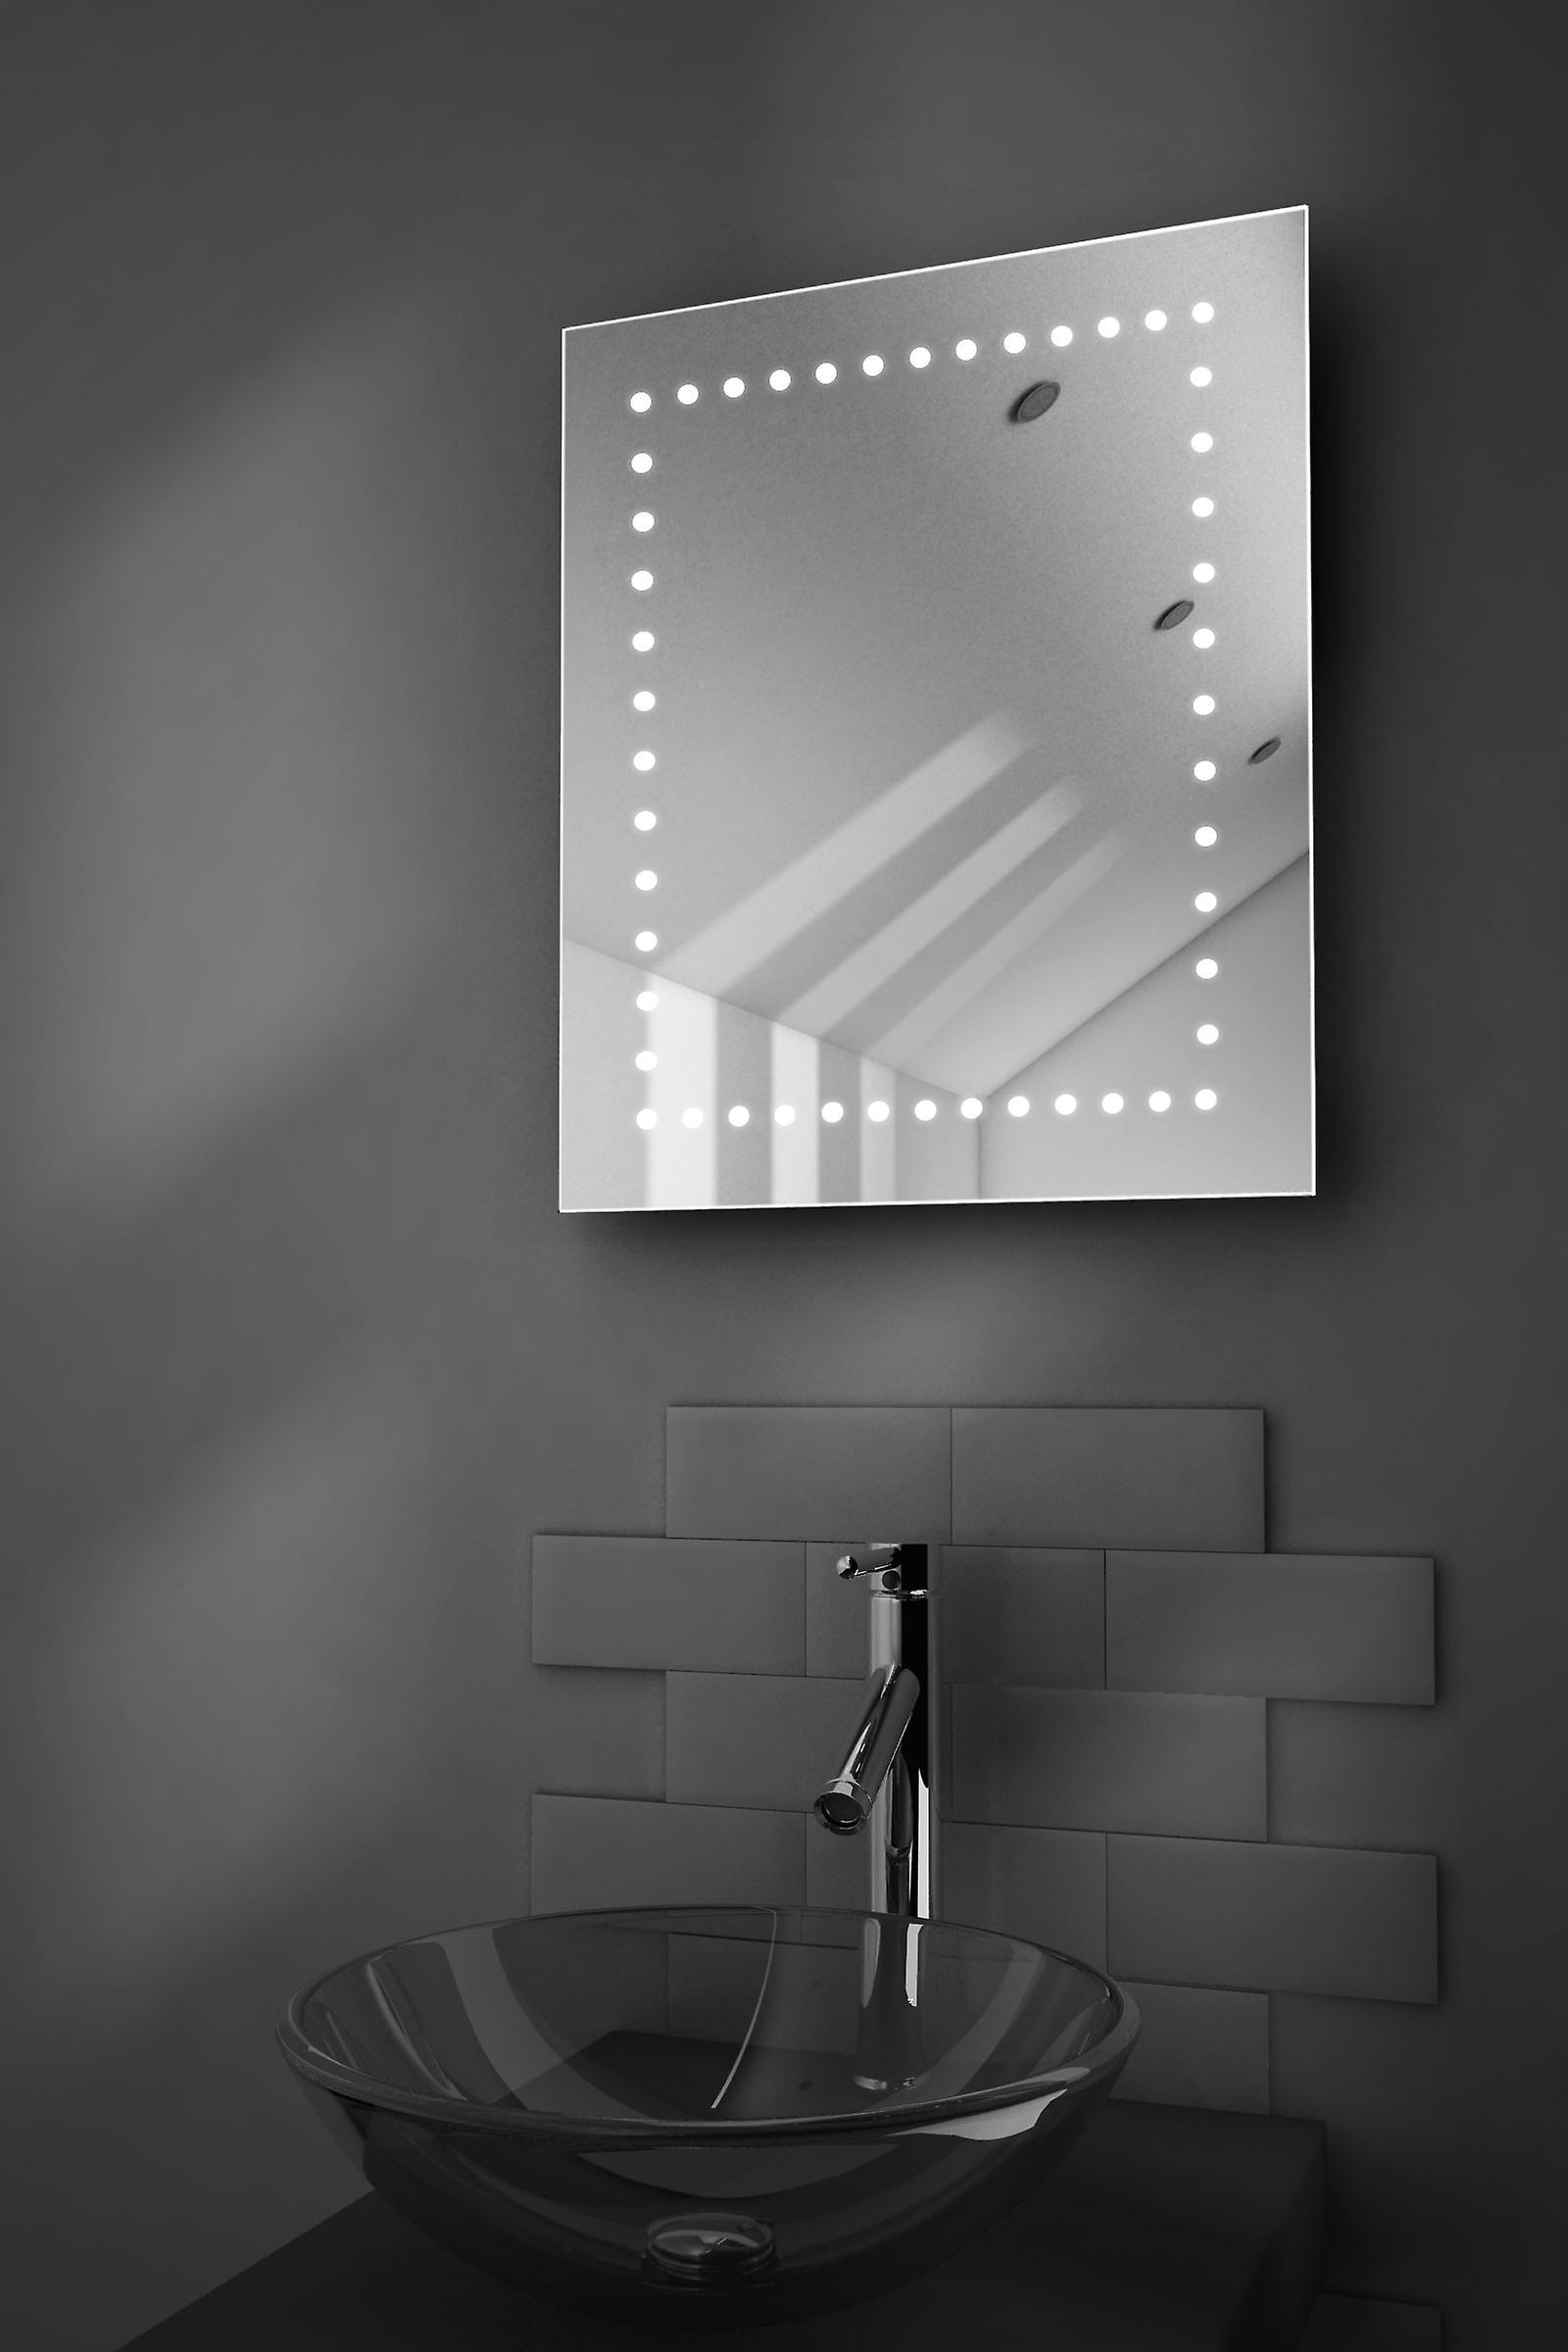 Desire Shaver LED Bathroom Mirror With Demister Pad & Sensor k39s